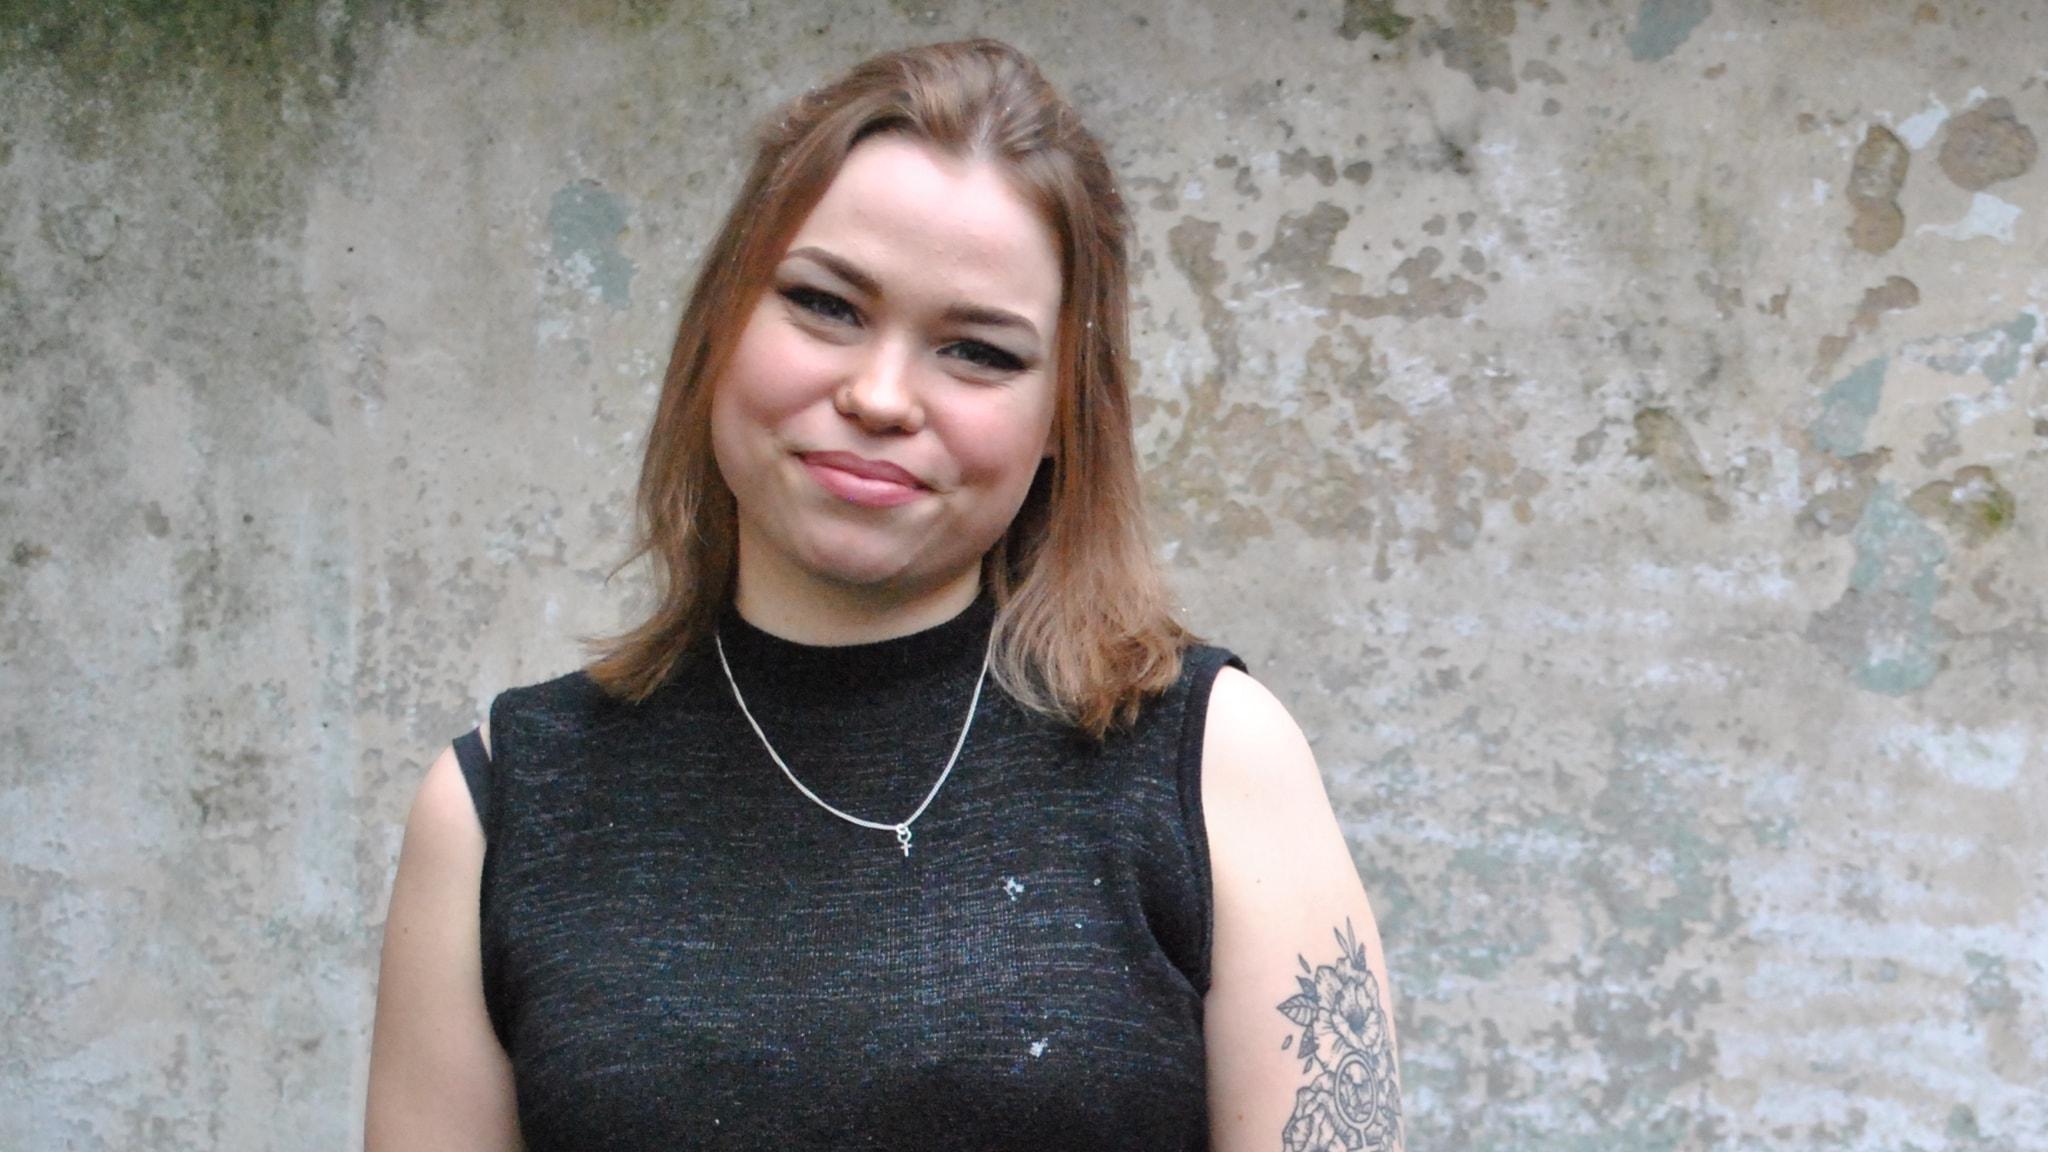 Emilie lever med kroniska smärtor i underlivet